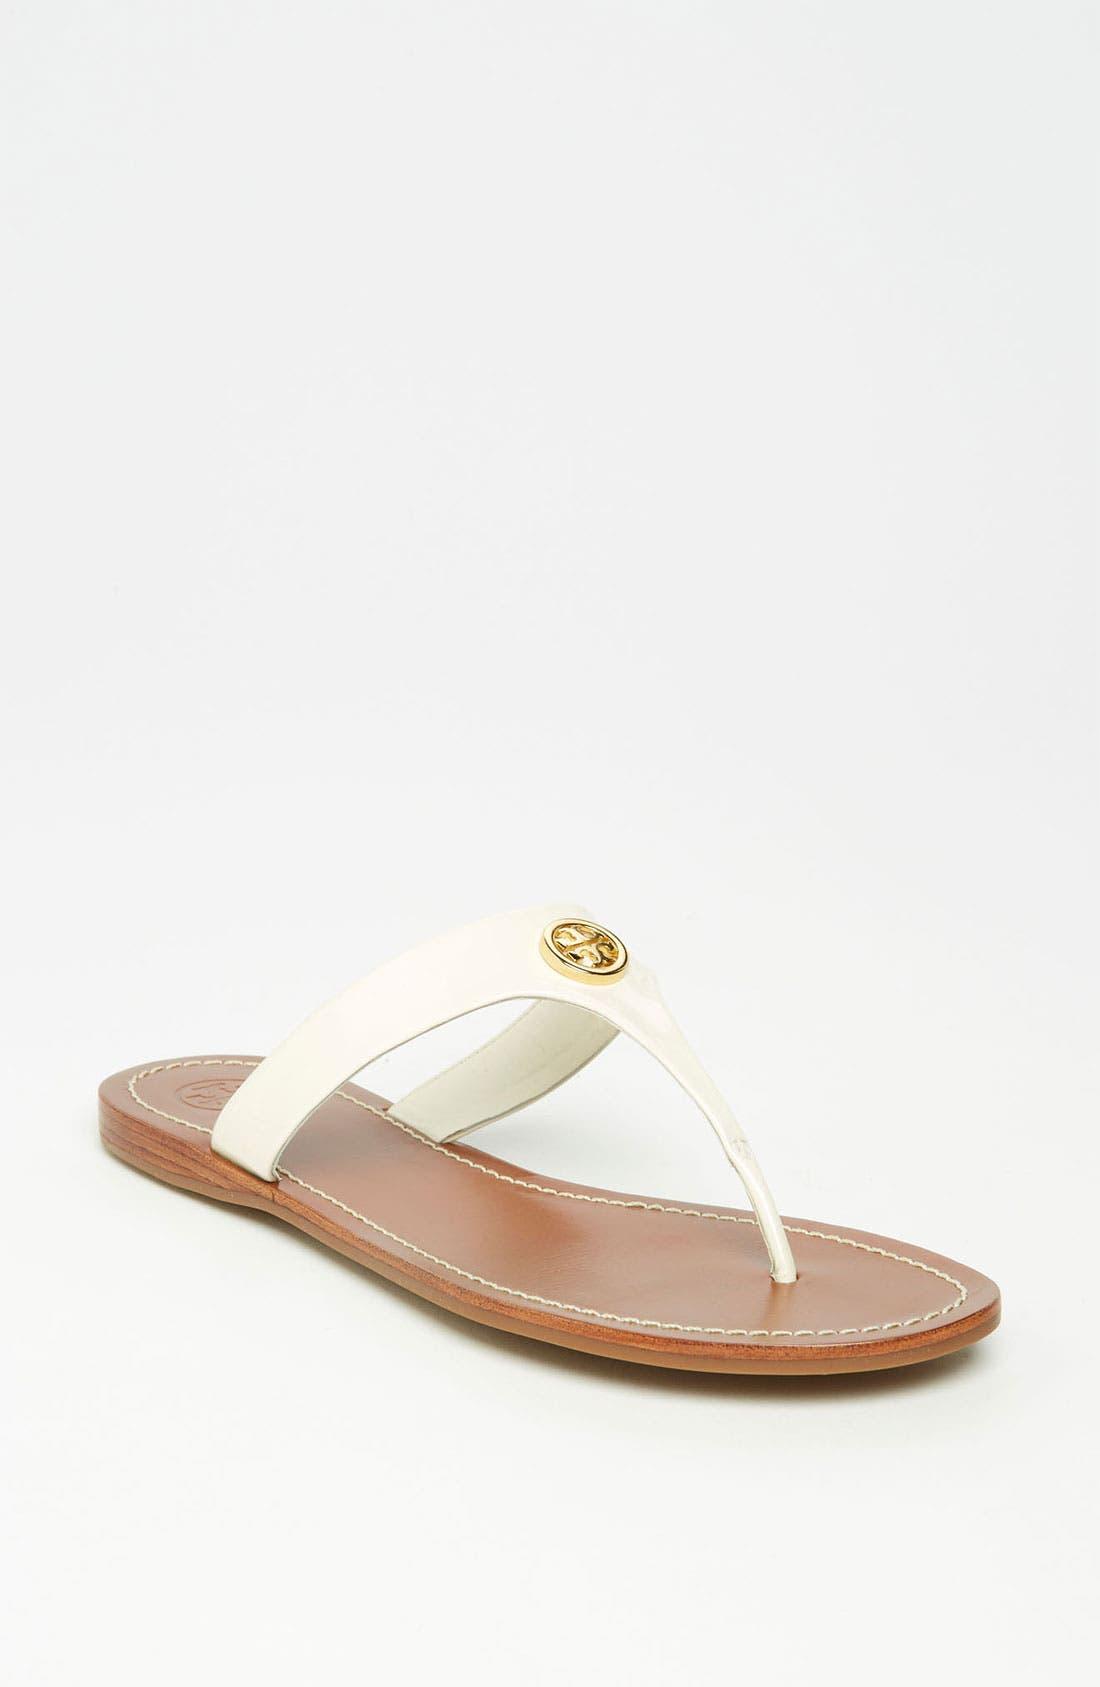 Alternate Image 1 Selected - Tory Burch 'Cameron' Sandal